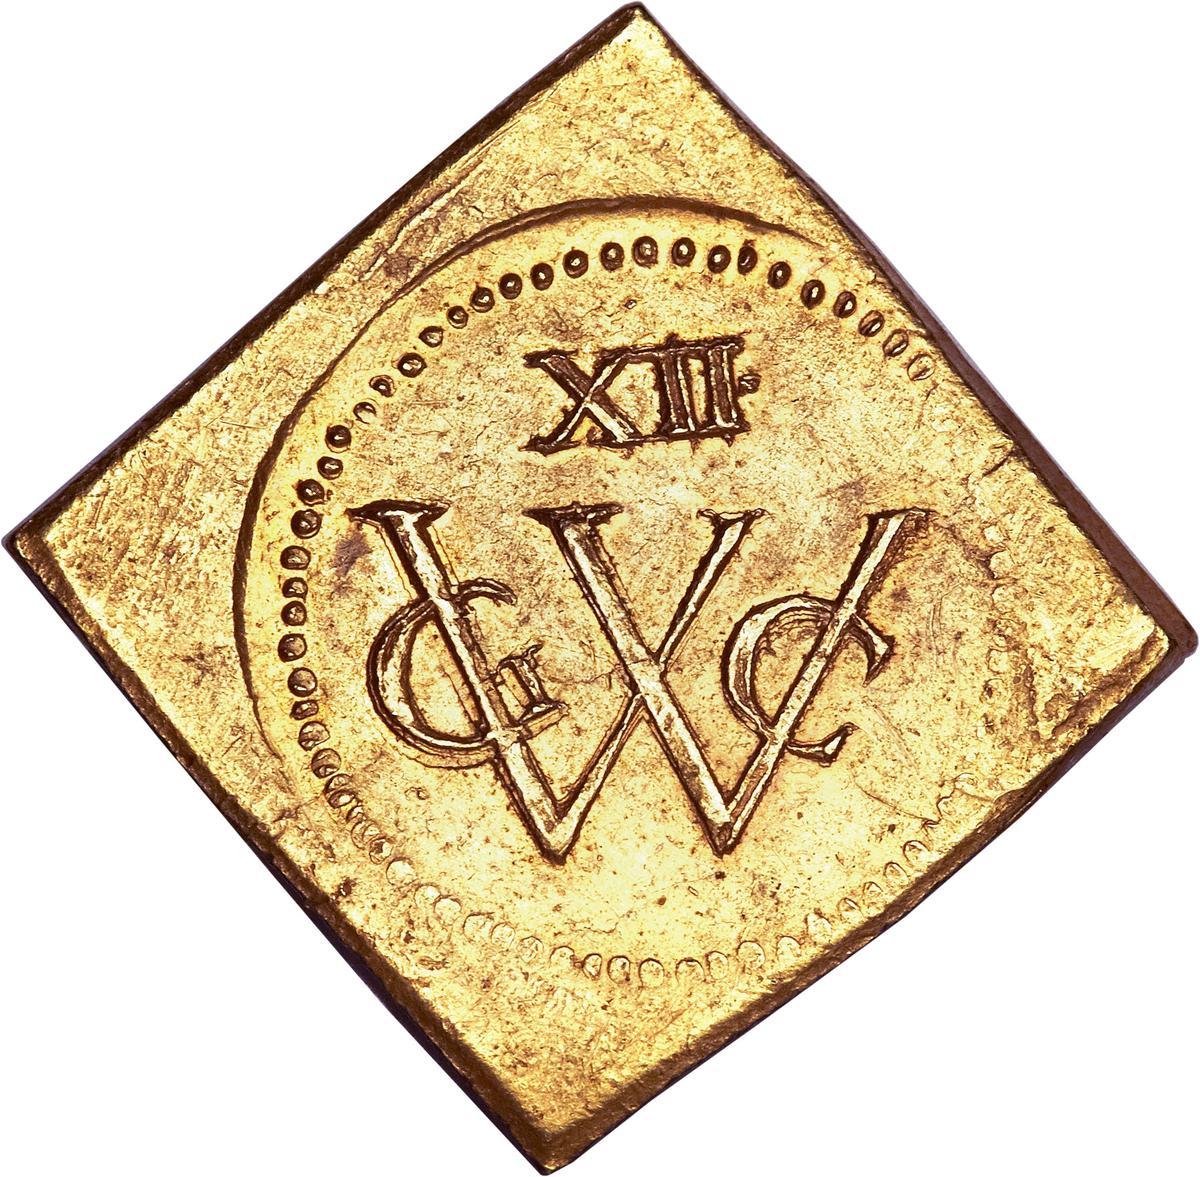 Coin 12 Florins (Geoctroyeerde Westindische Compagnie) New Holland obverse